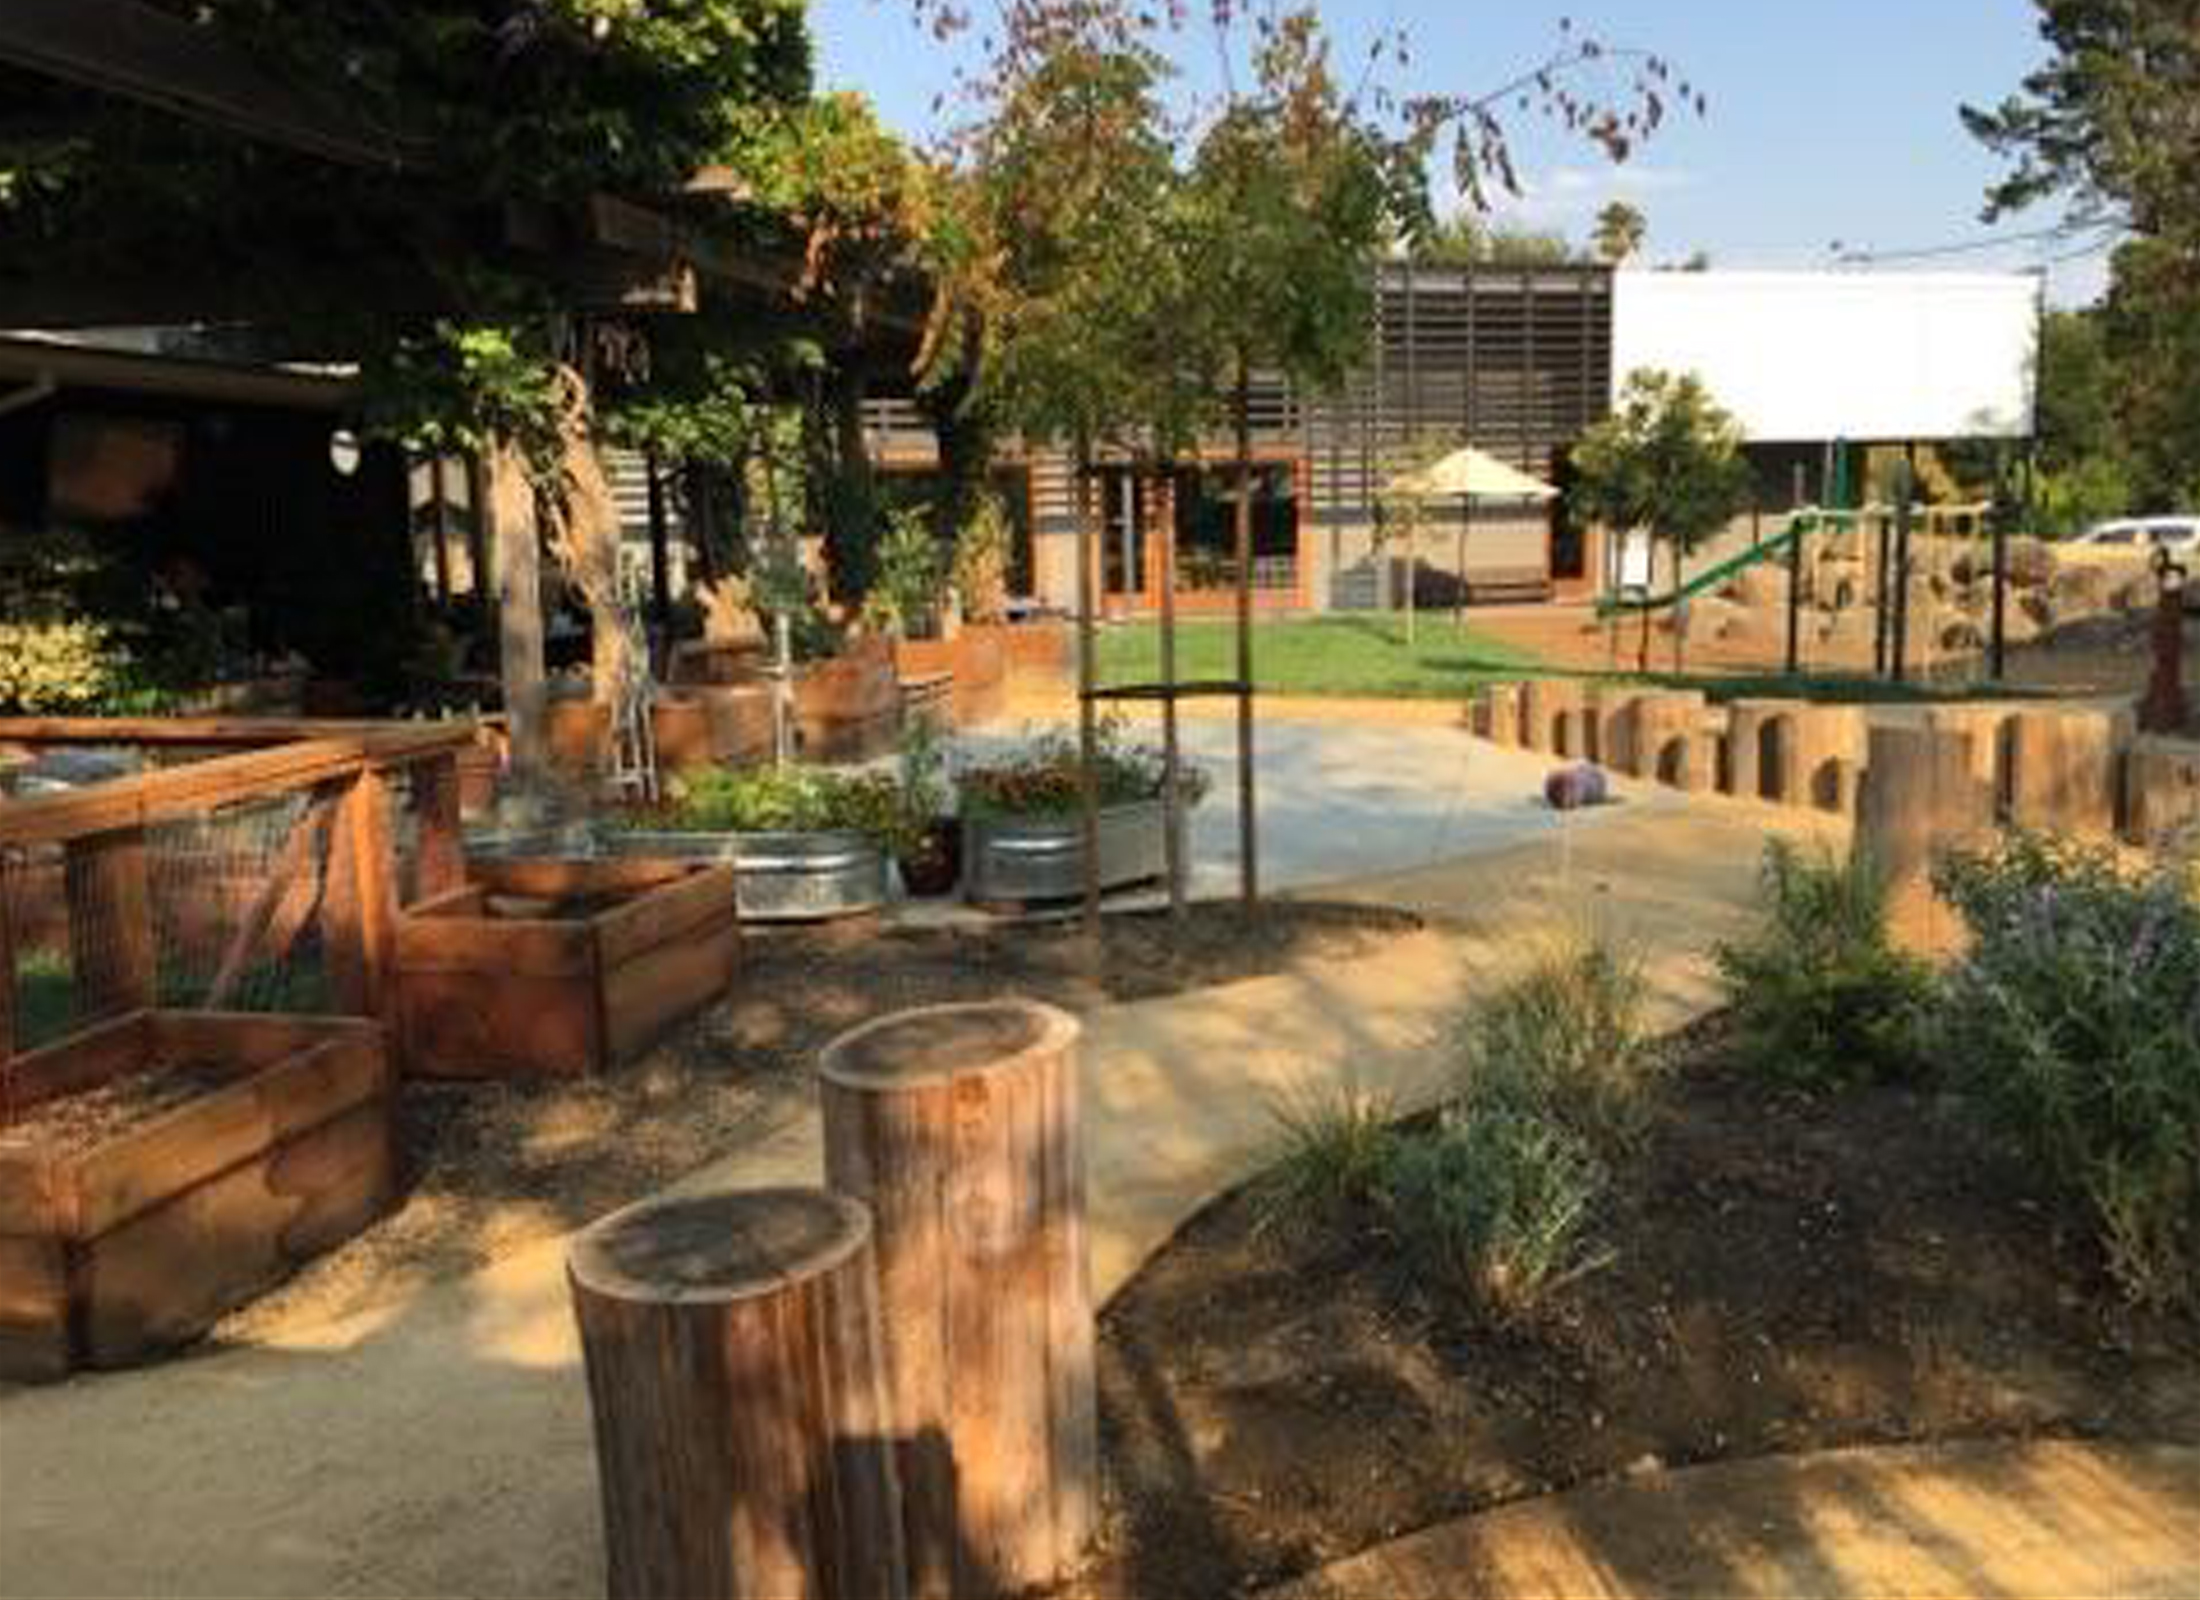 Montessori de terra linda playscape learning landscapes for Learn landscape design